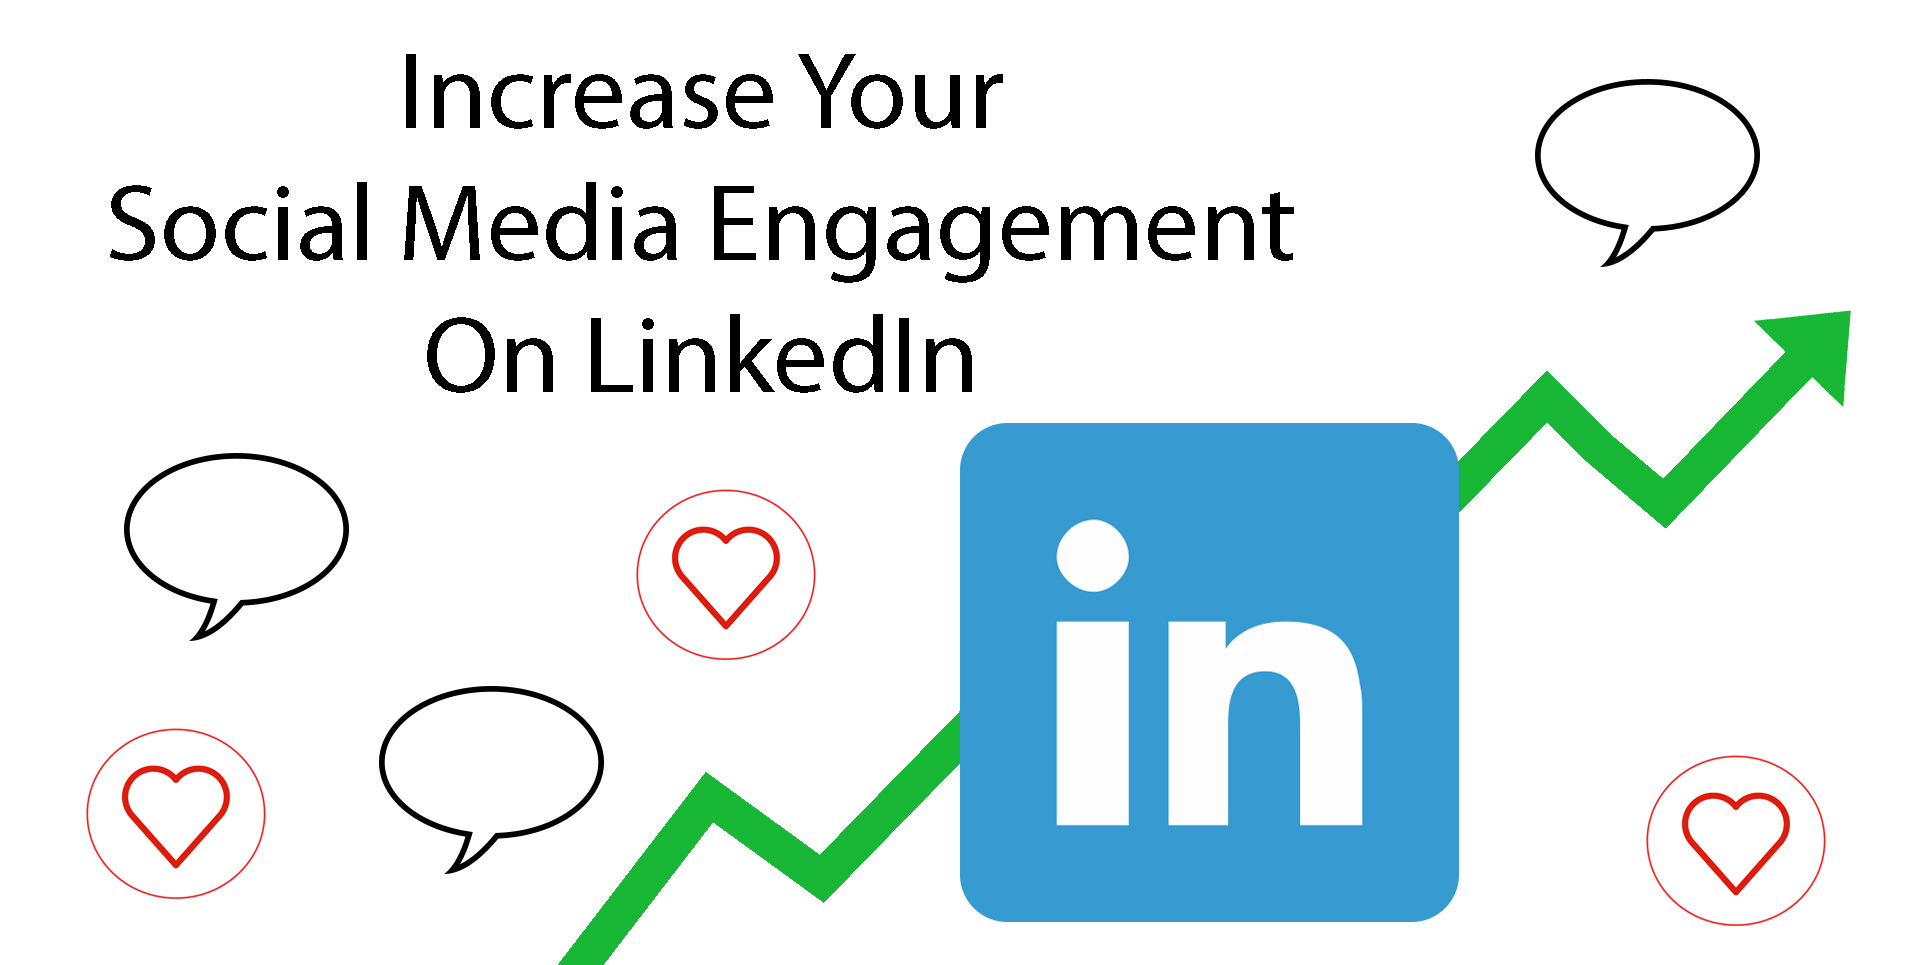 Increase engagement on LinkedIn